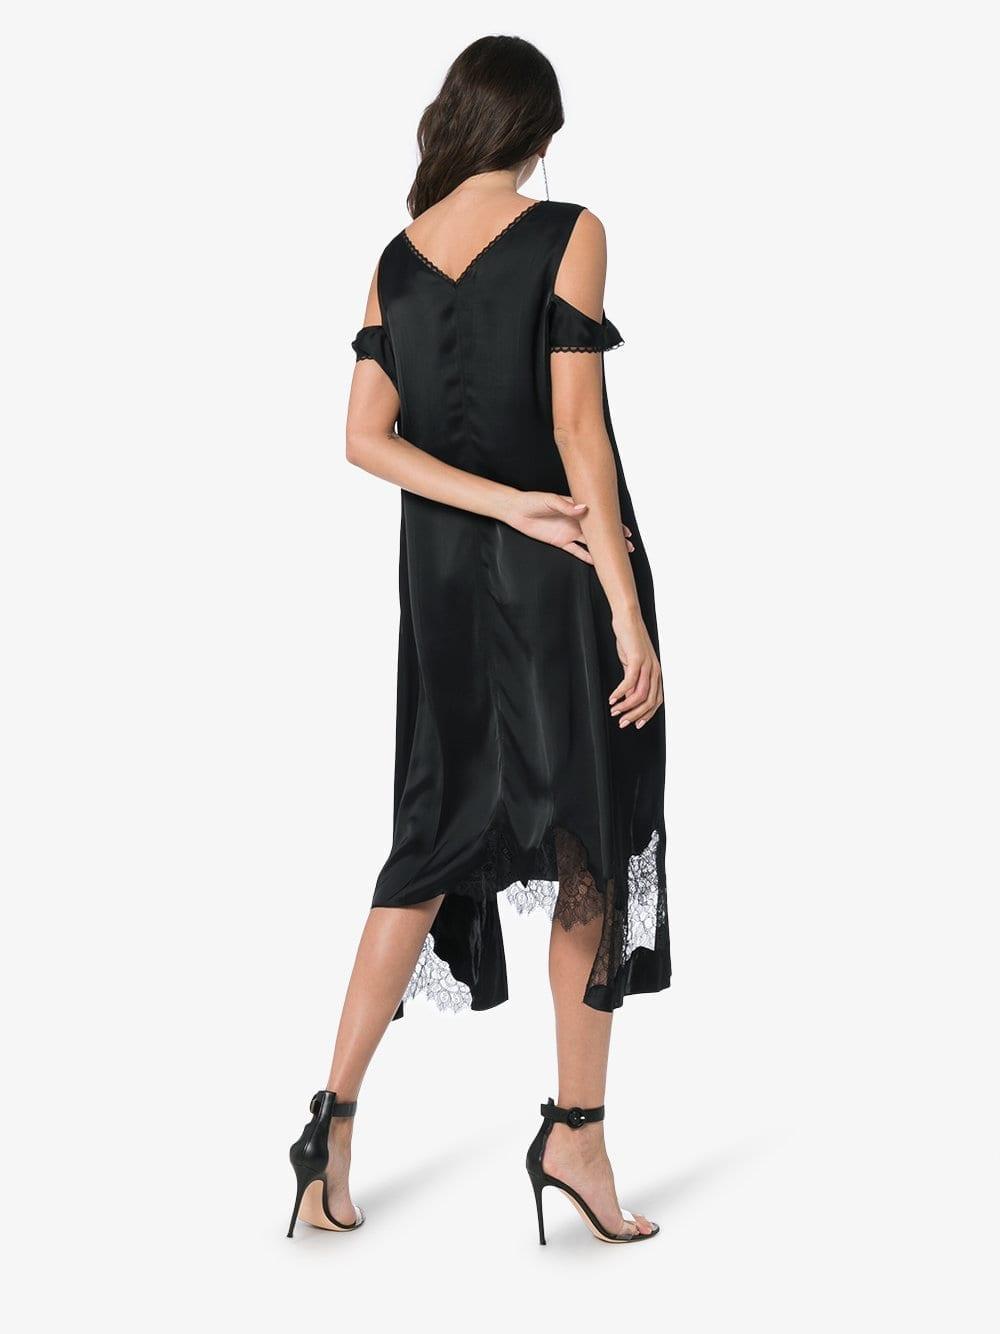 HELMUT LANG Silk Deconstructed Slip Black Dress